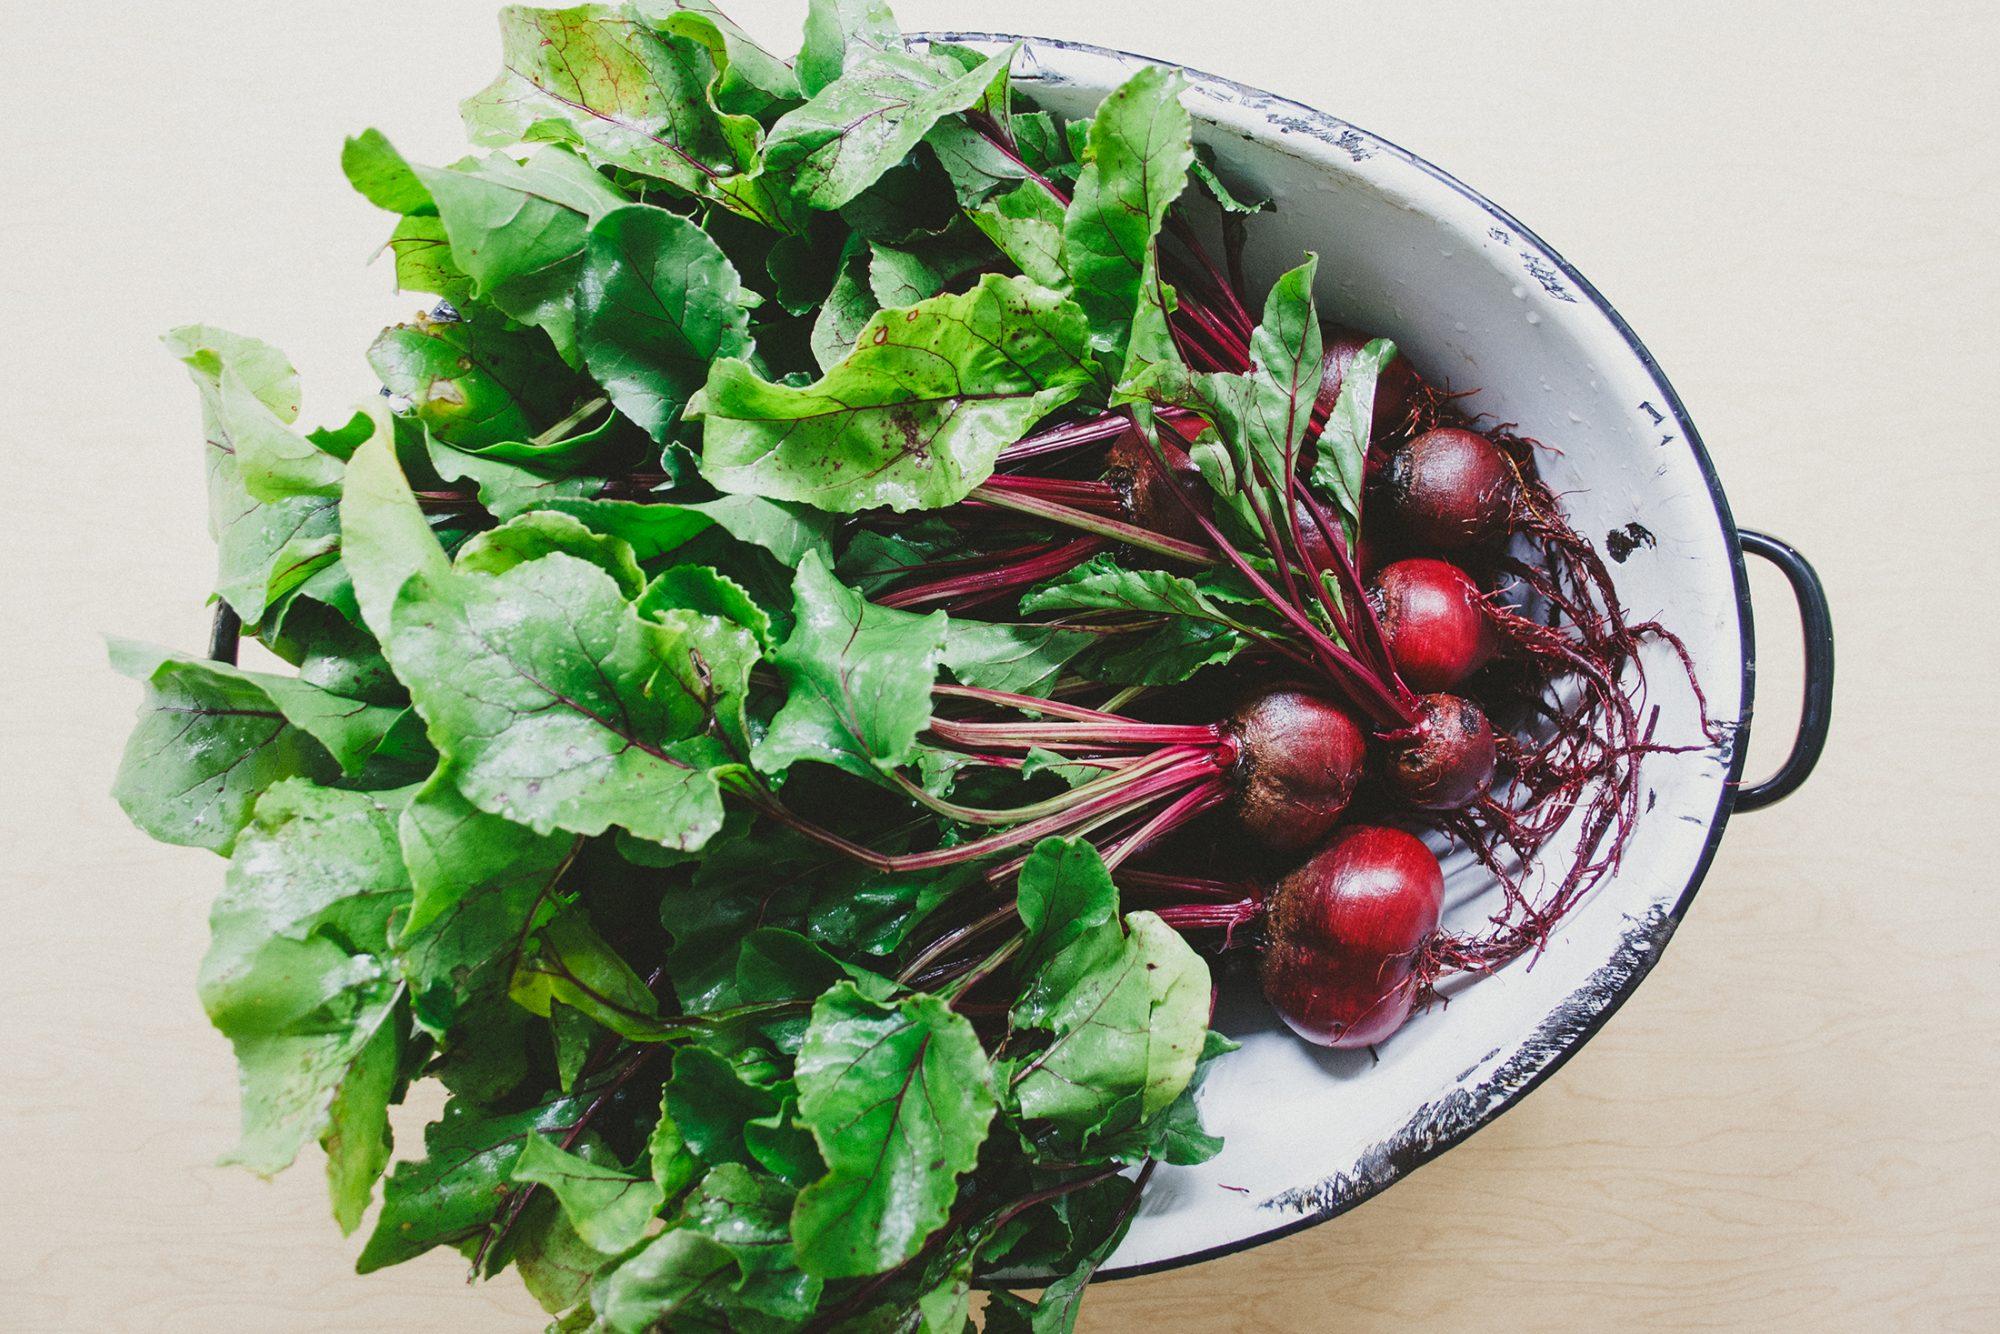 beet greens-639162112.jpg